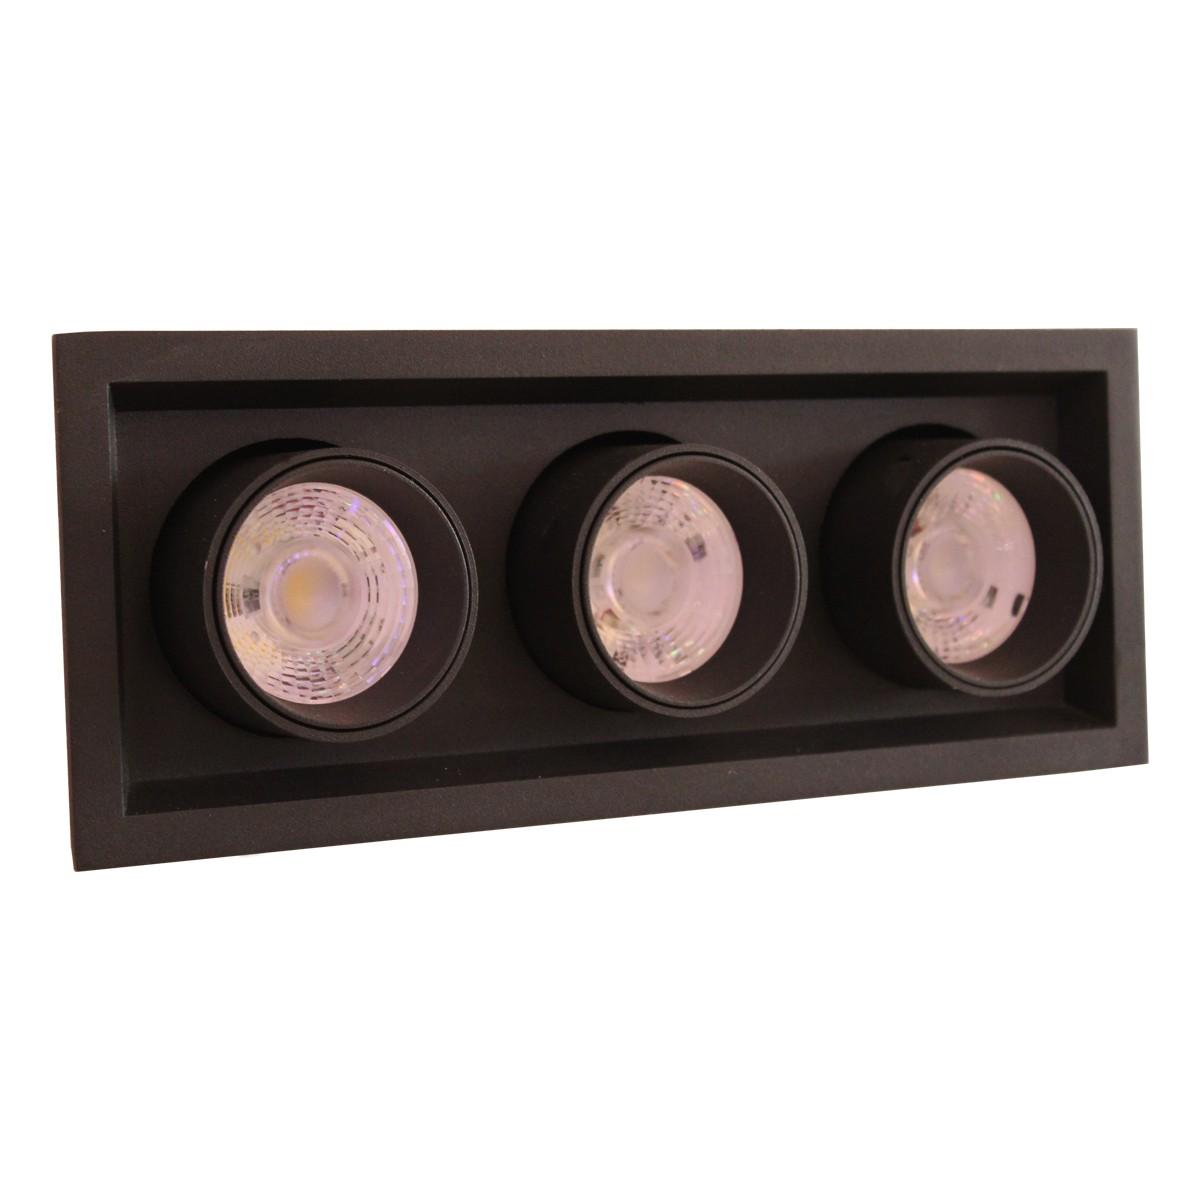 Sv.DOWNLIGHT LED DURBUN 3*10W 4000K BLACK (TEKL)8